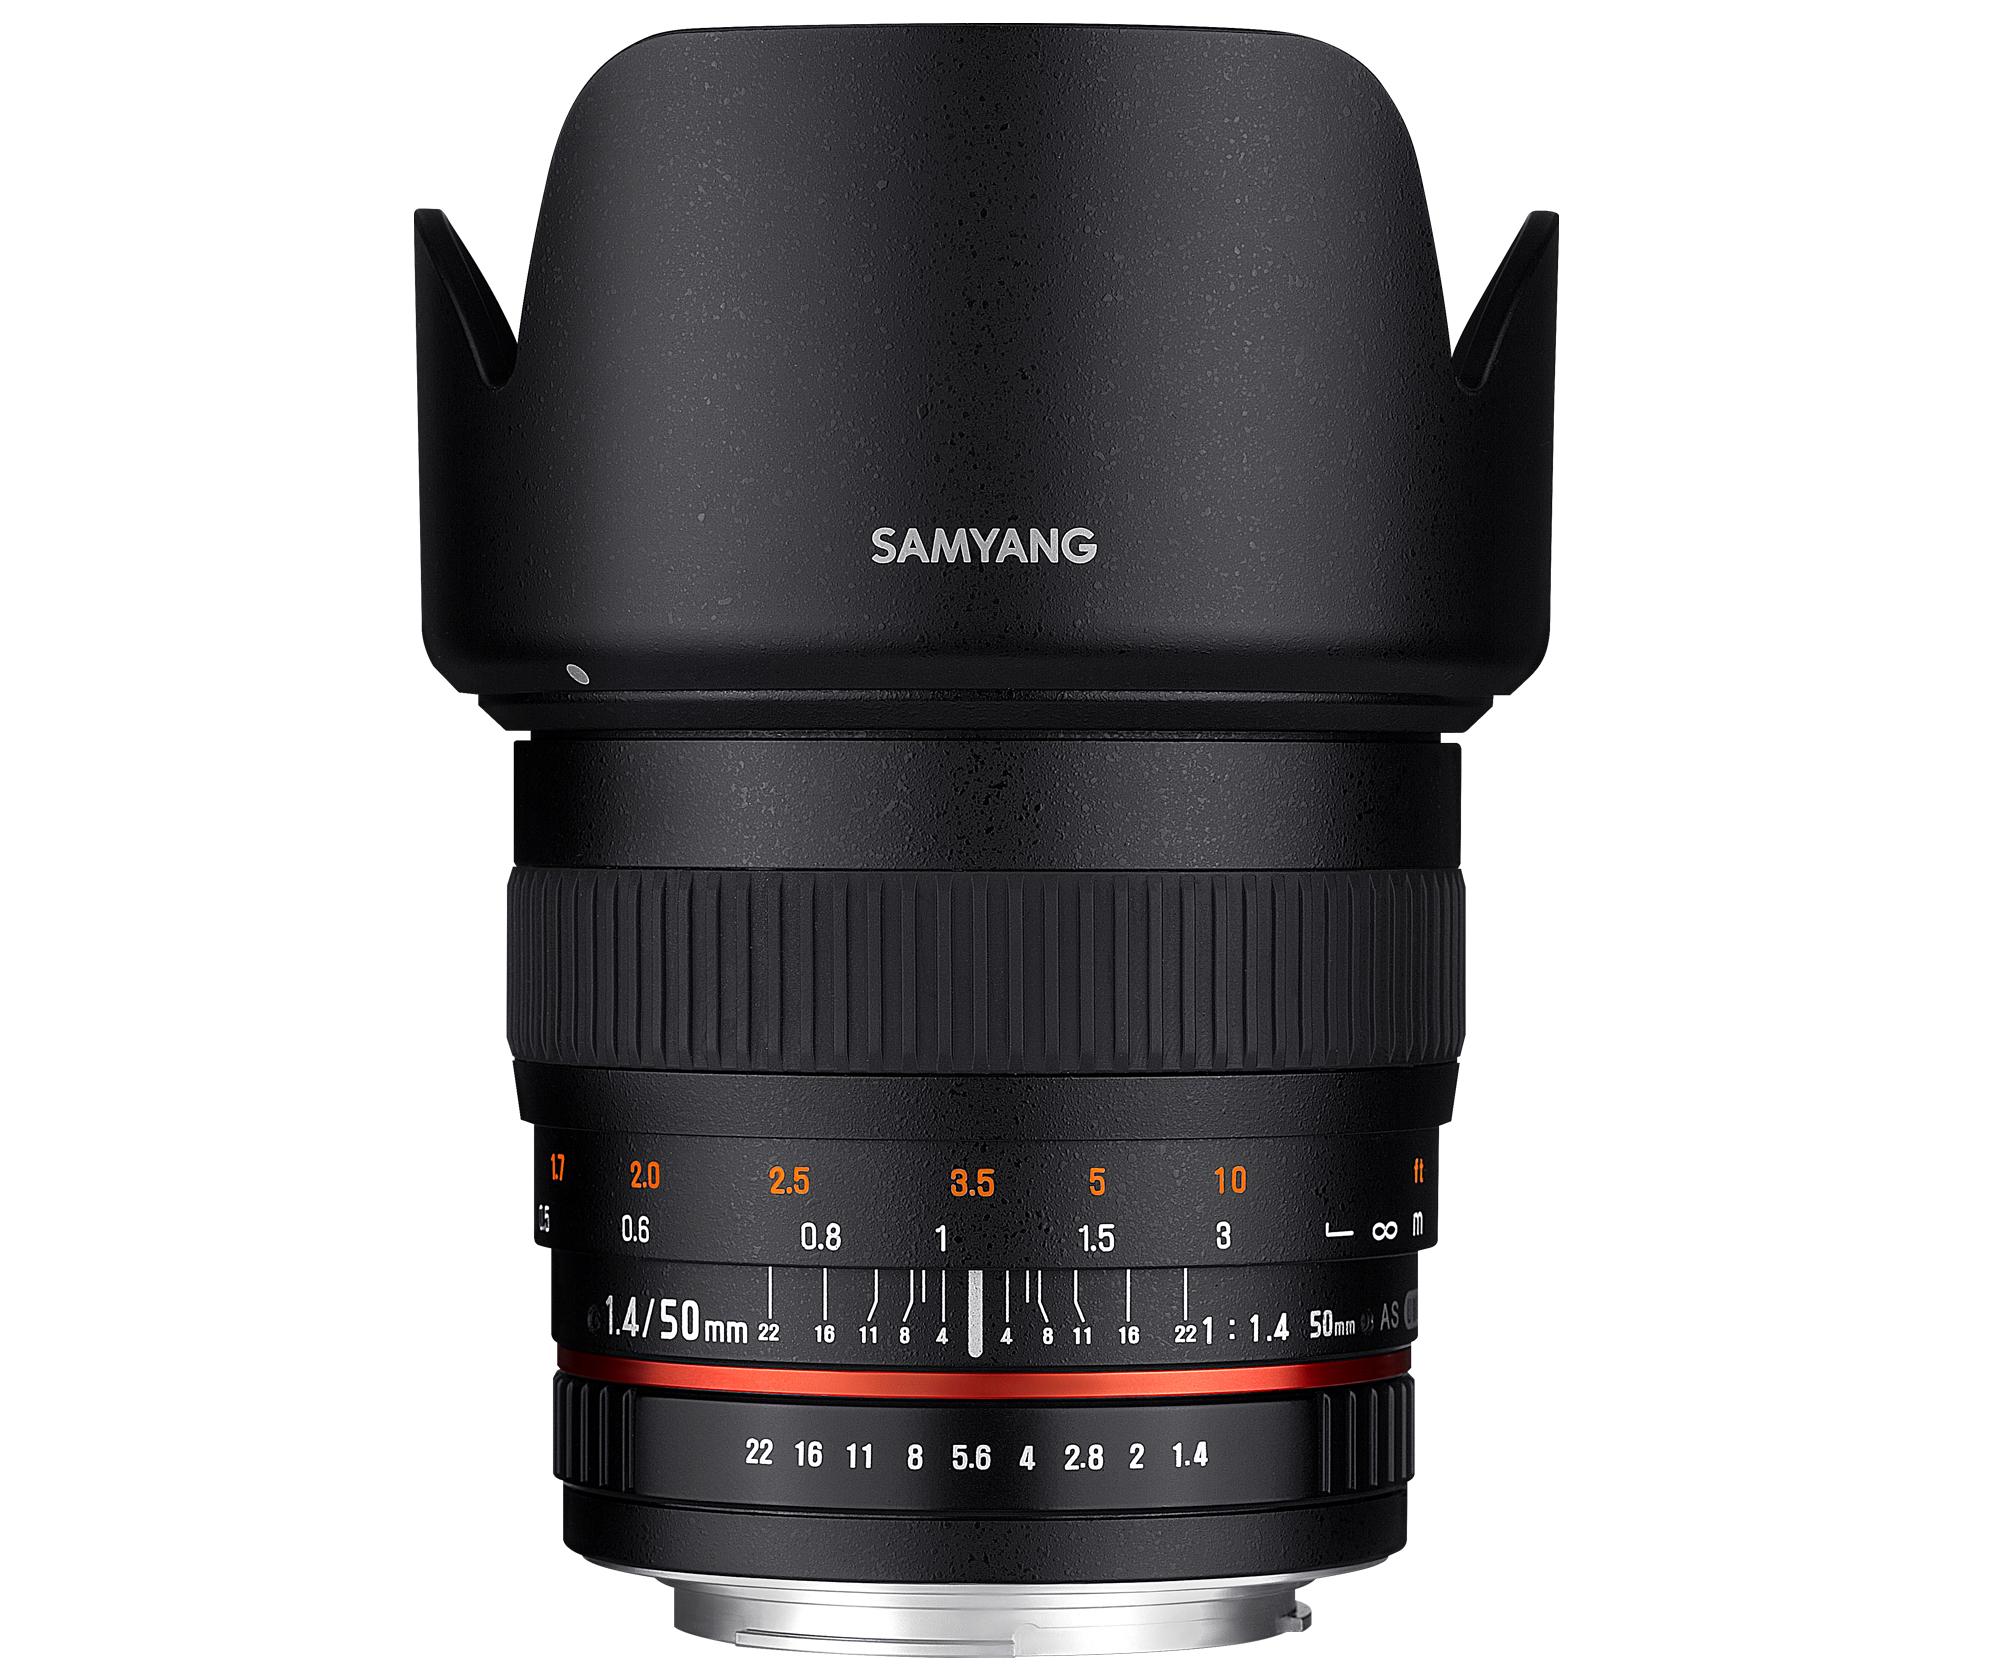 SAMYANG 50mm F1.4 AS UMC ※在庫お問い合わせください